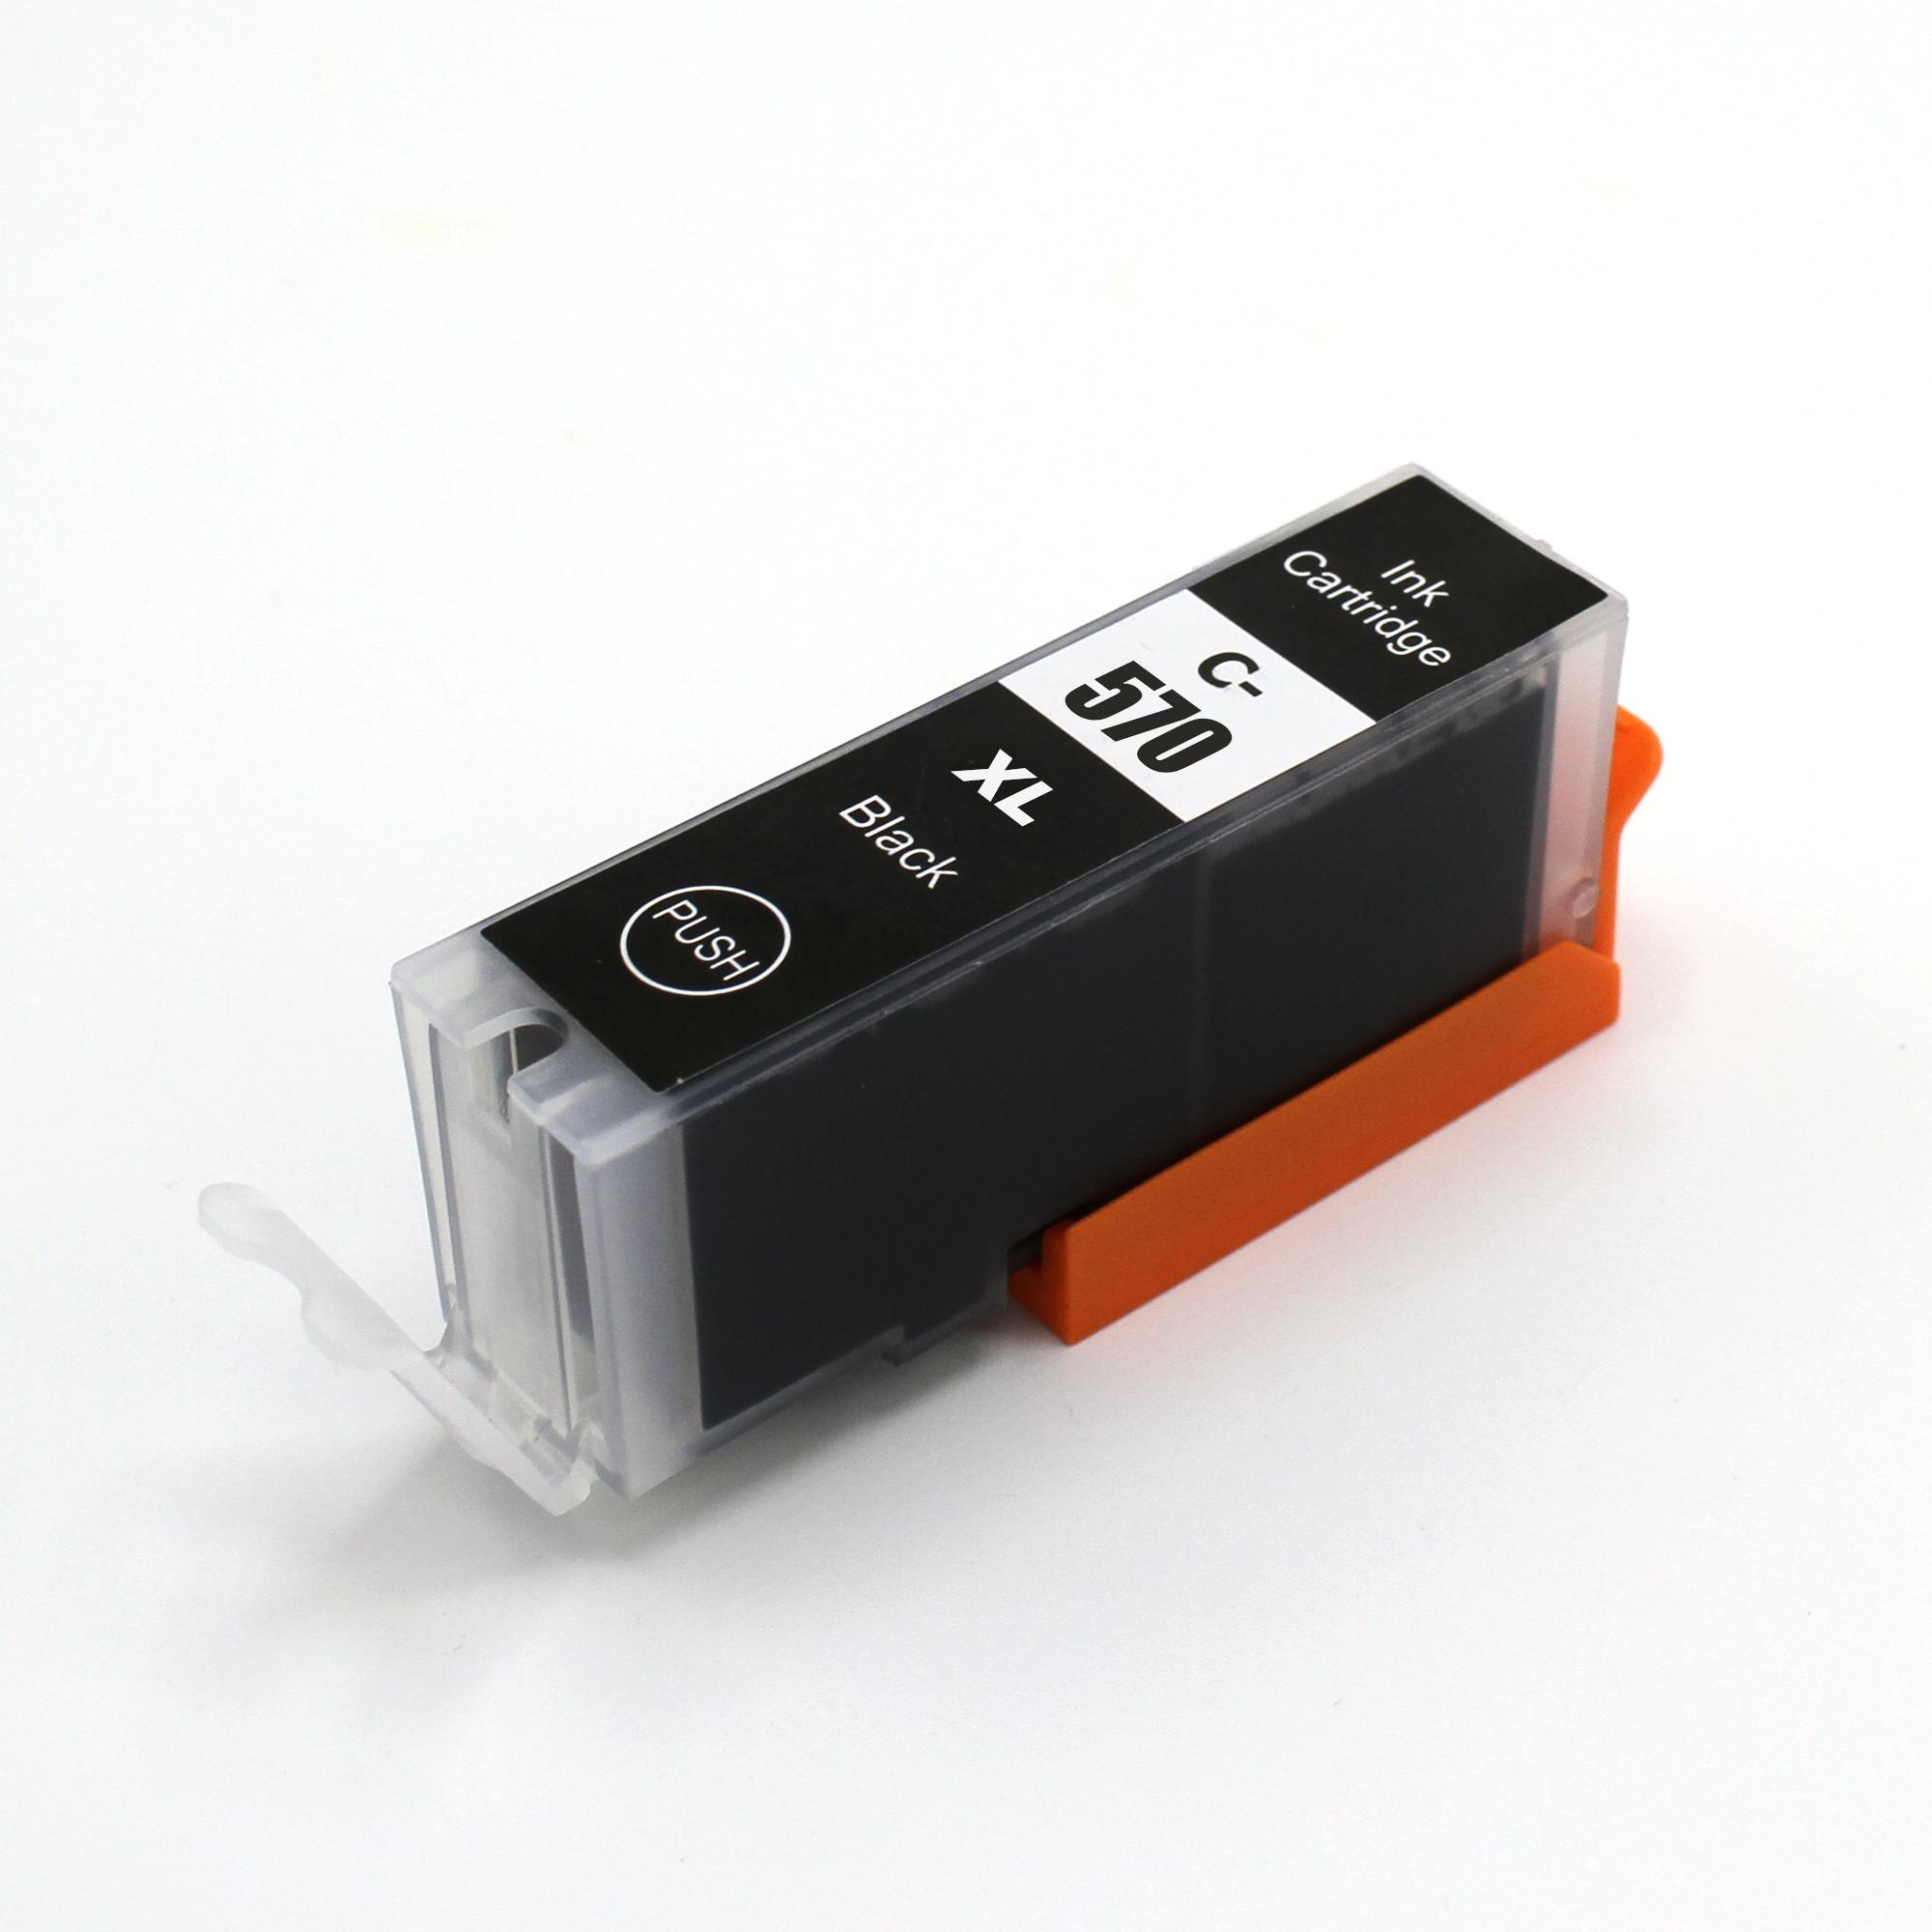 Compatible Canon PGI-570XL Black Ink Cartridge